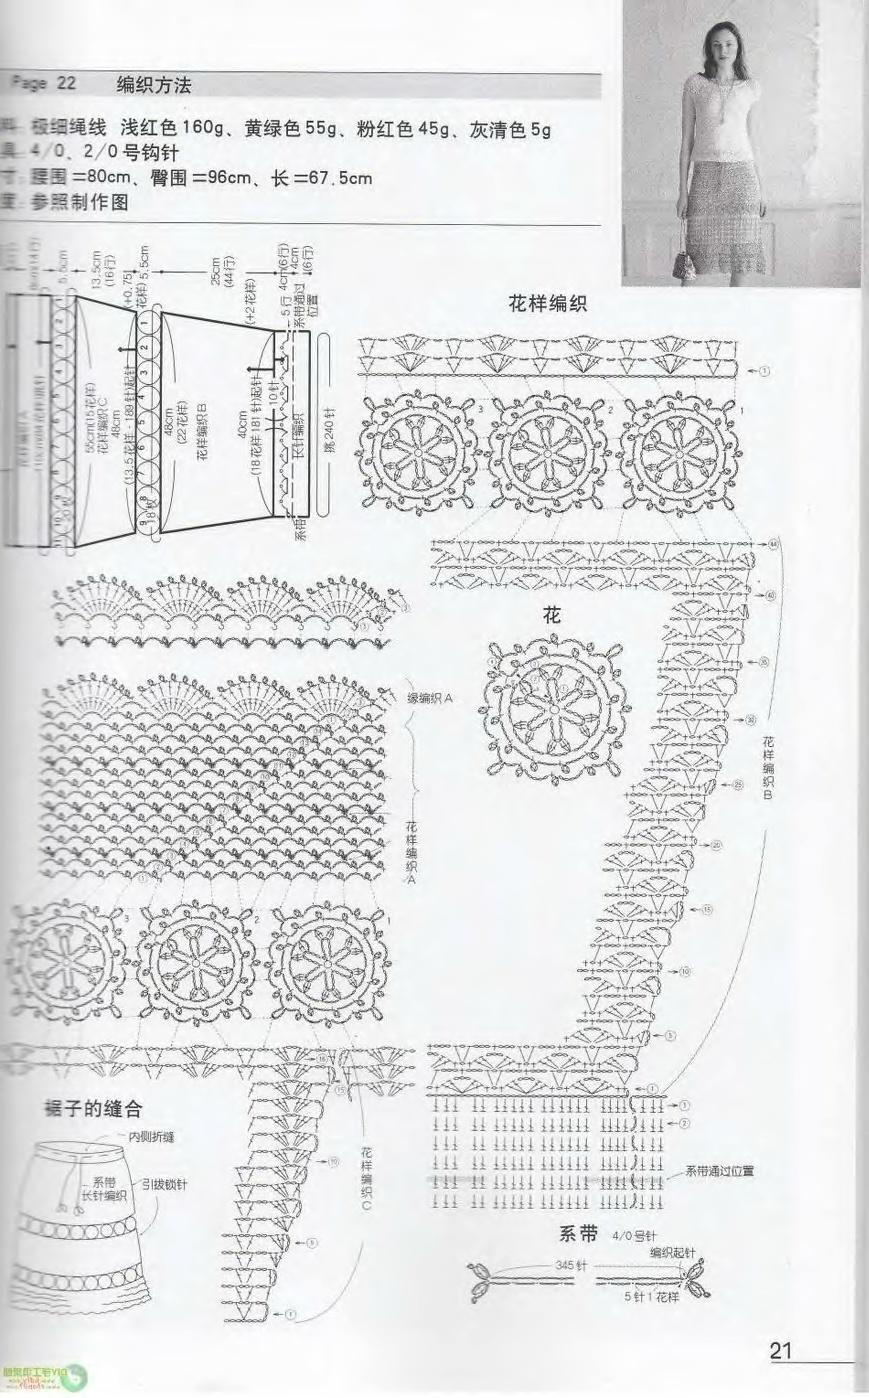 PATRONES JAPONESES A CROCHET GRATIS ~ TODO PATRONES CROCHET GRATIS ...